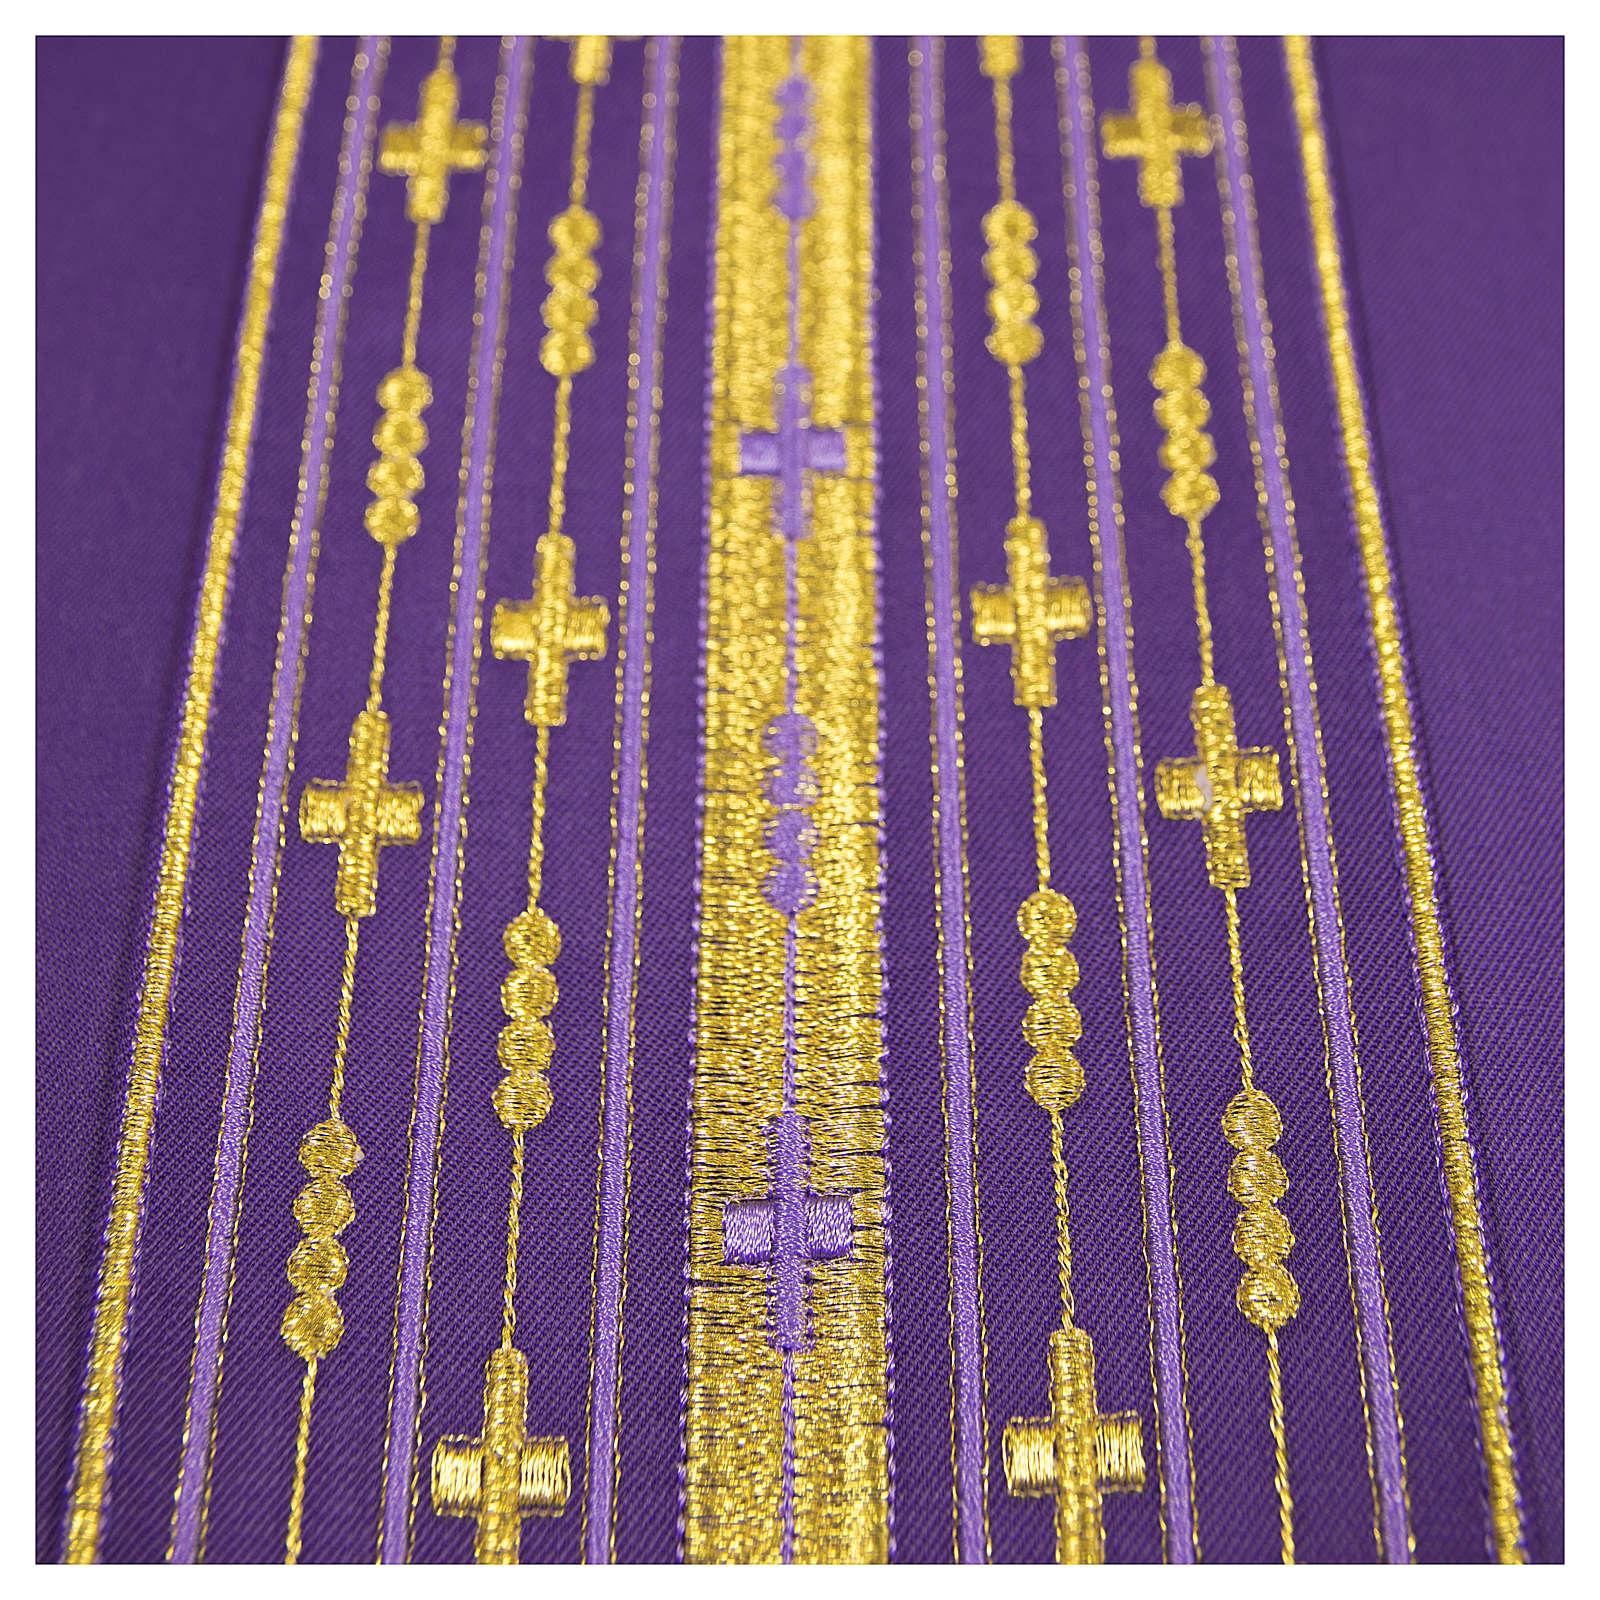 Casula lana pura ricamo lineare 4